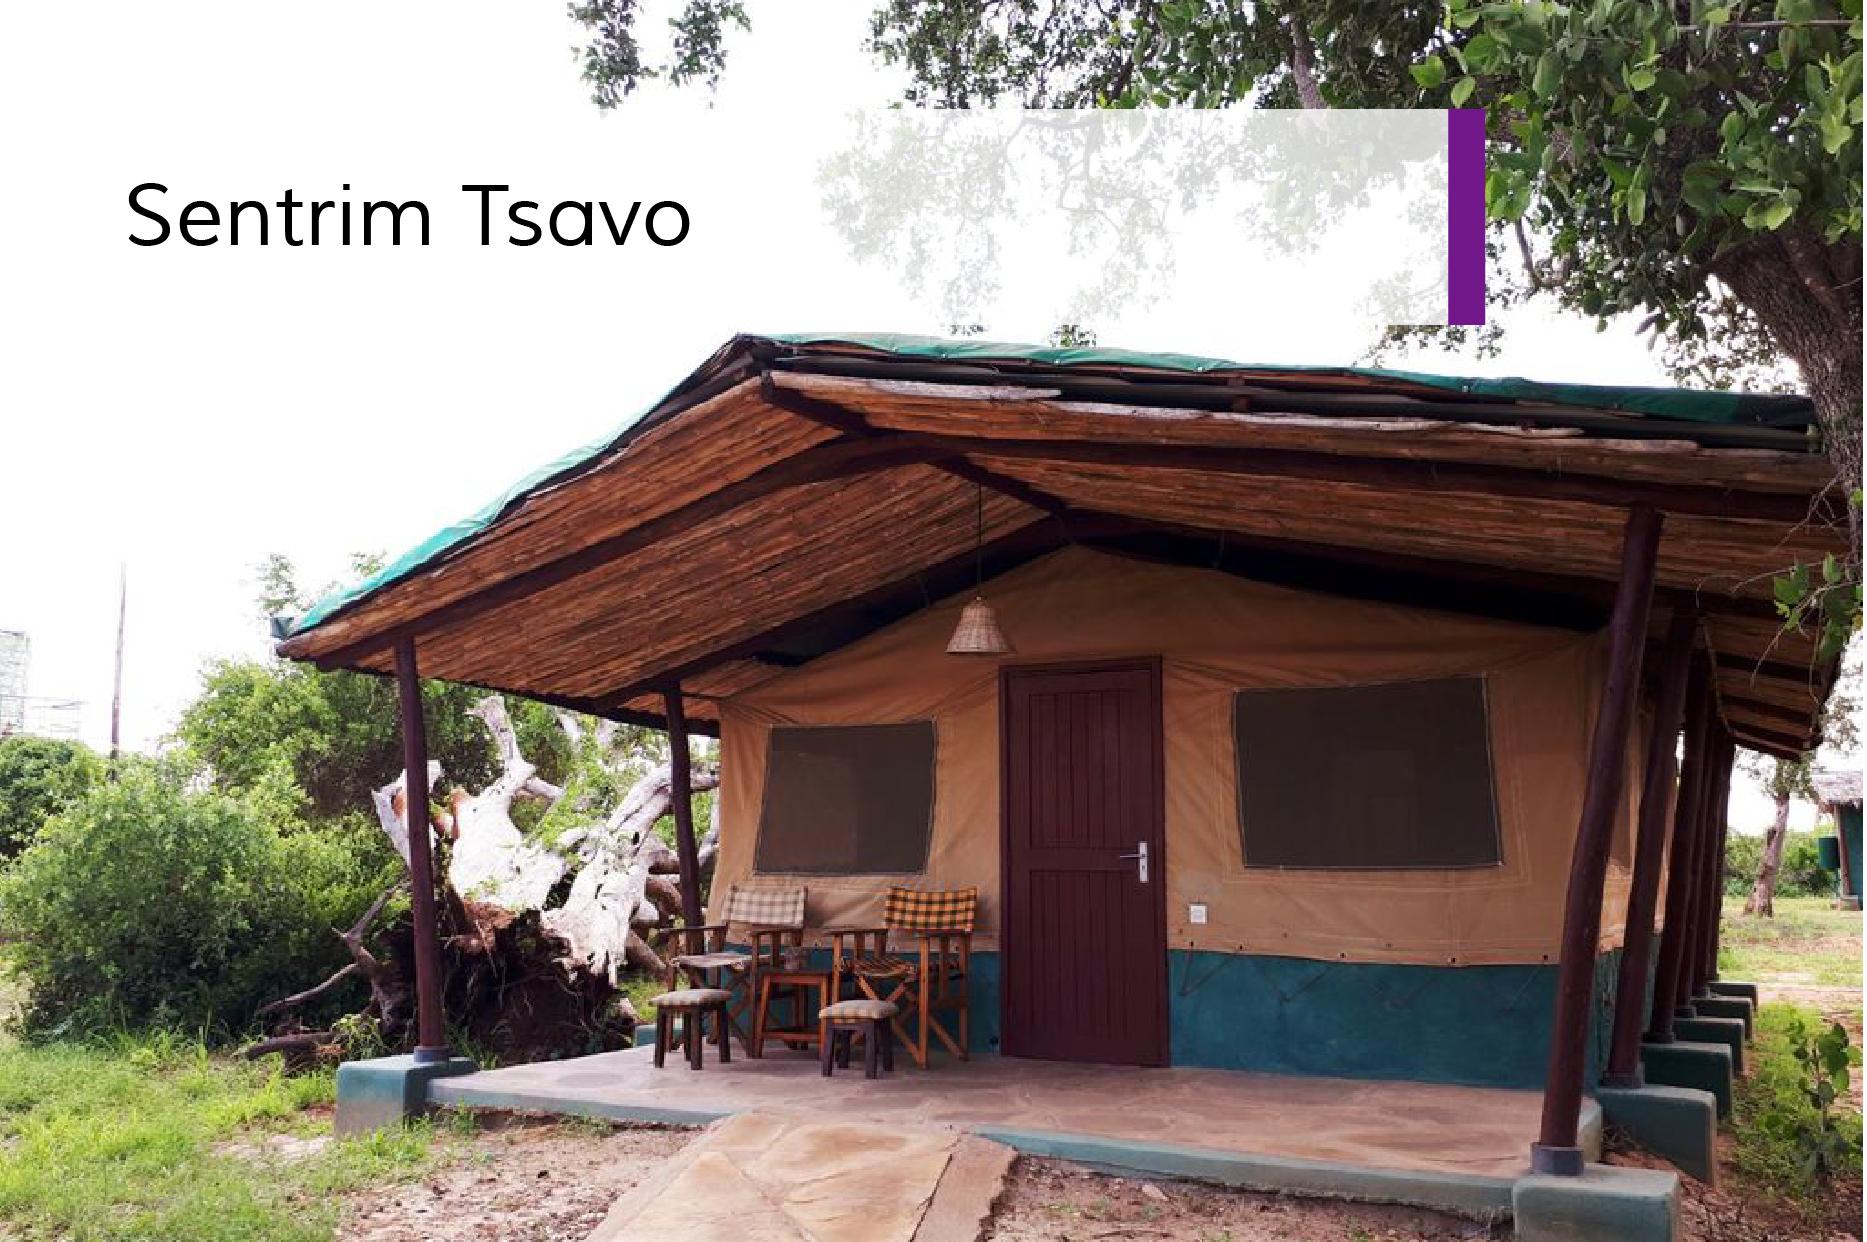 Sentrim Tsavo